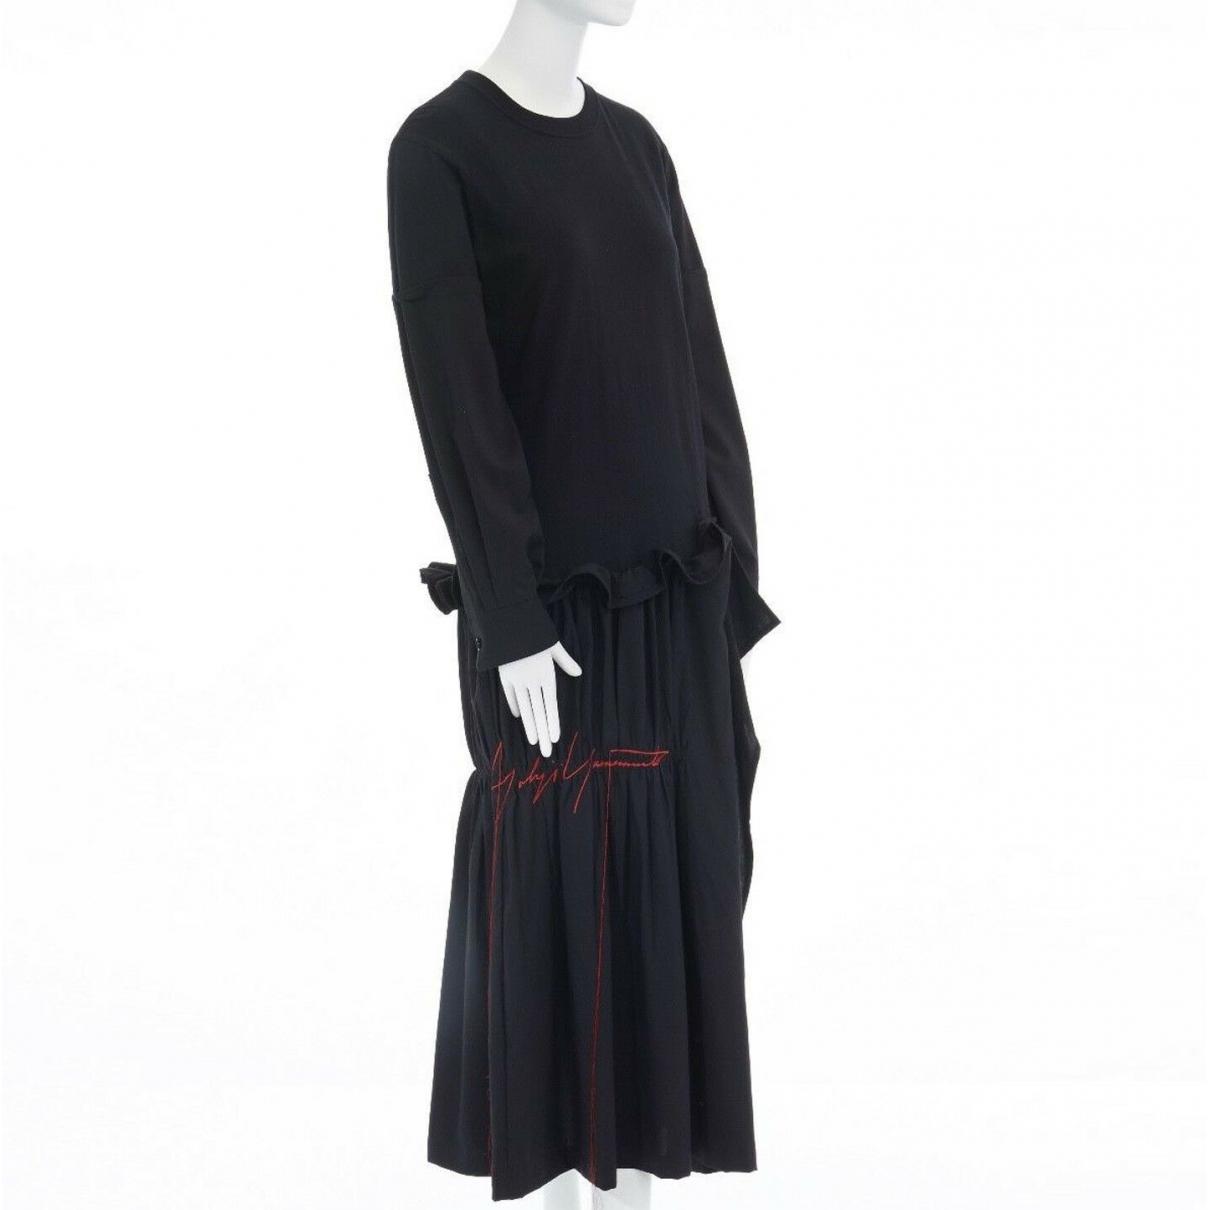 Yohji Yamamoto \N Black Cotton dress for Women 42 IT